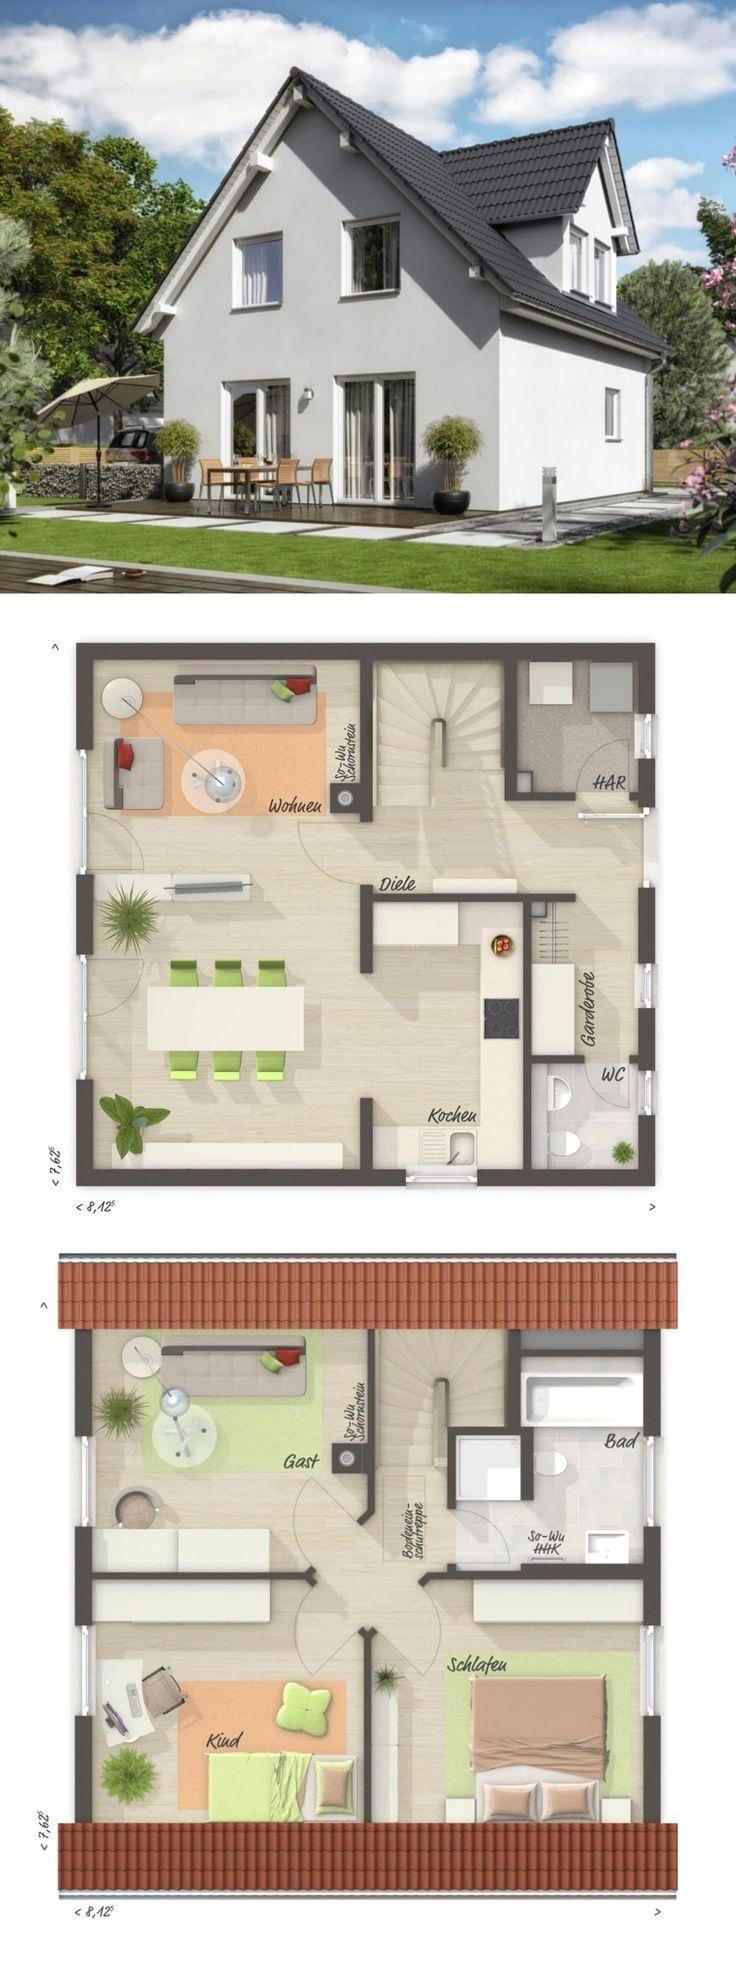 Photo of #home #house #houseplan #dreamhome #newhome #homedesi